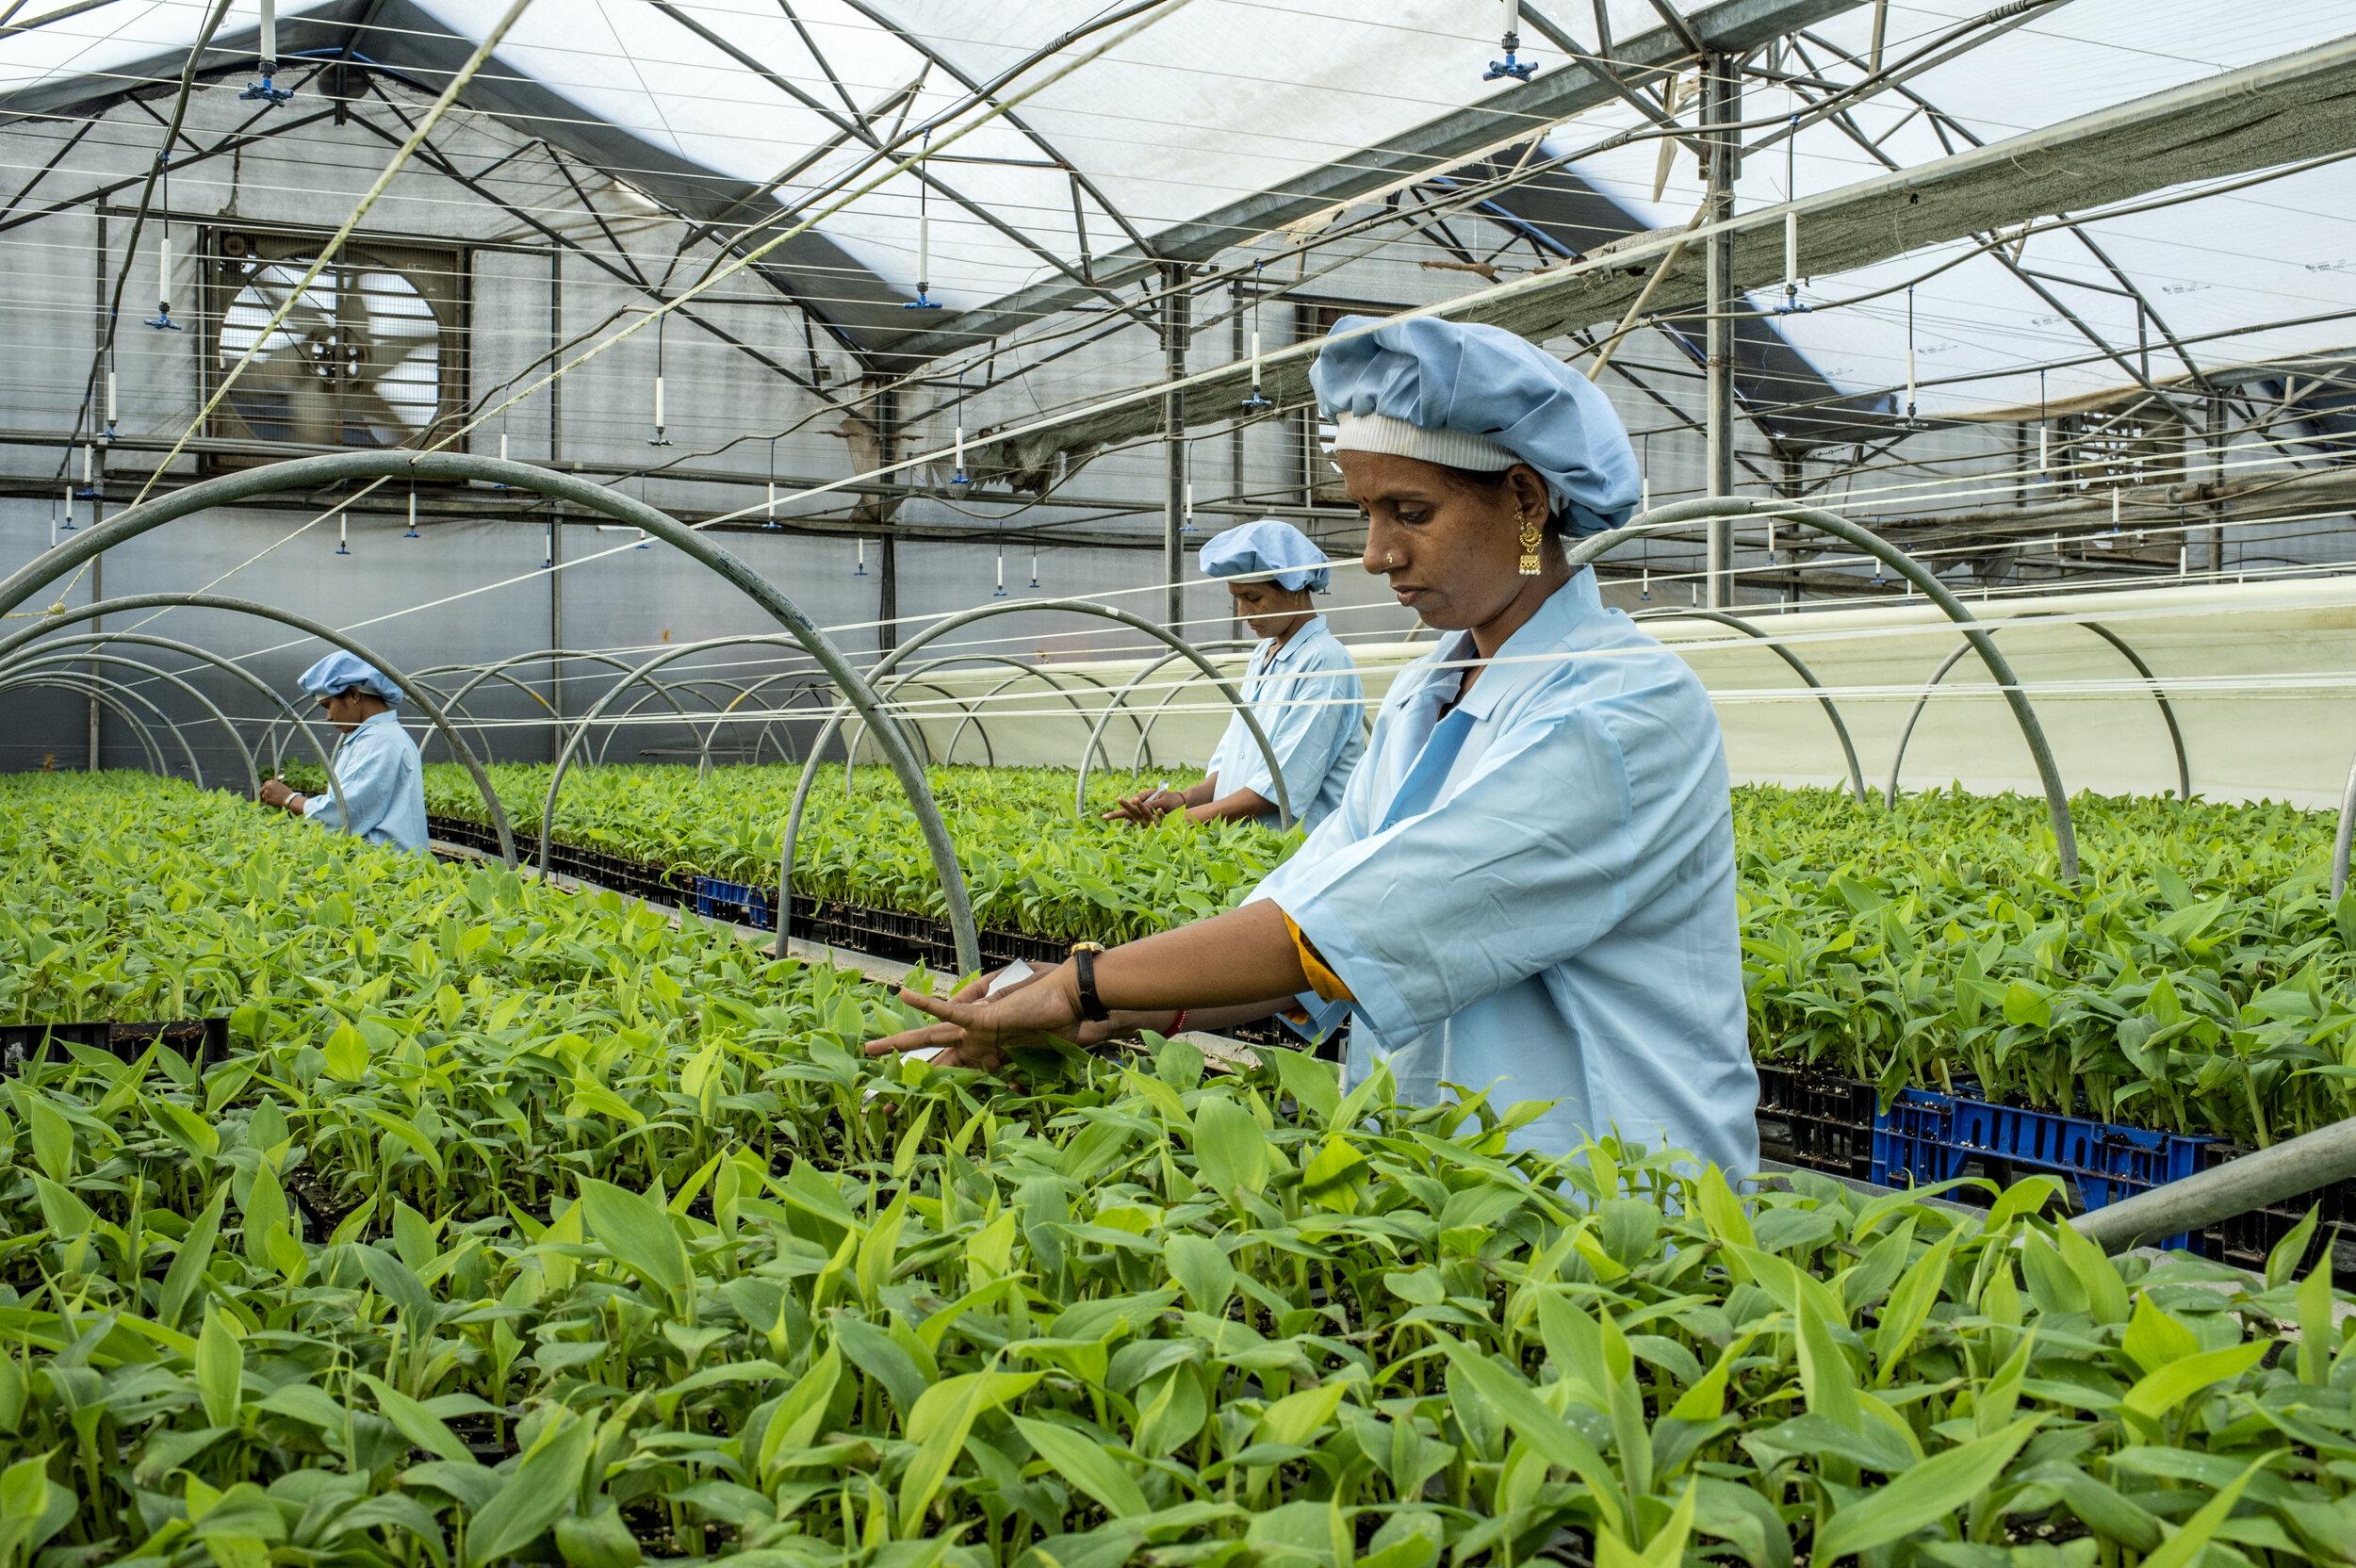 Tending the banana saplings – micro-irrigation project, Jalgaon, India (© FOLU/Panos)